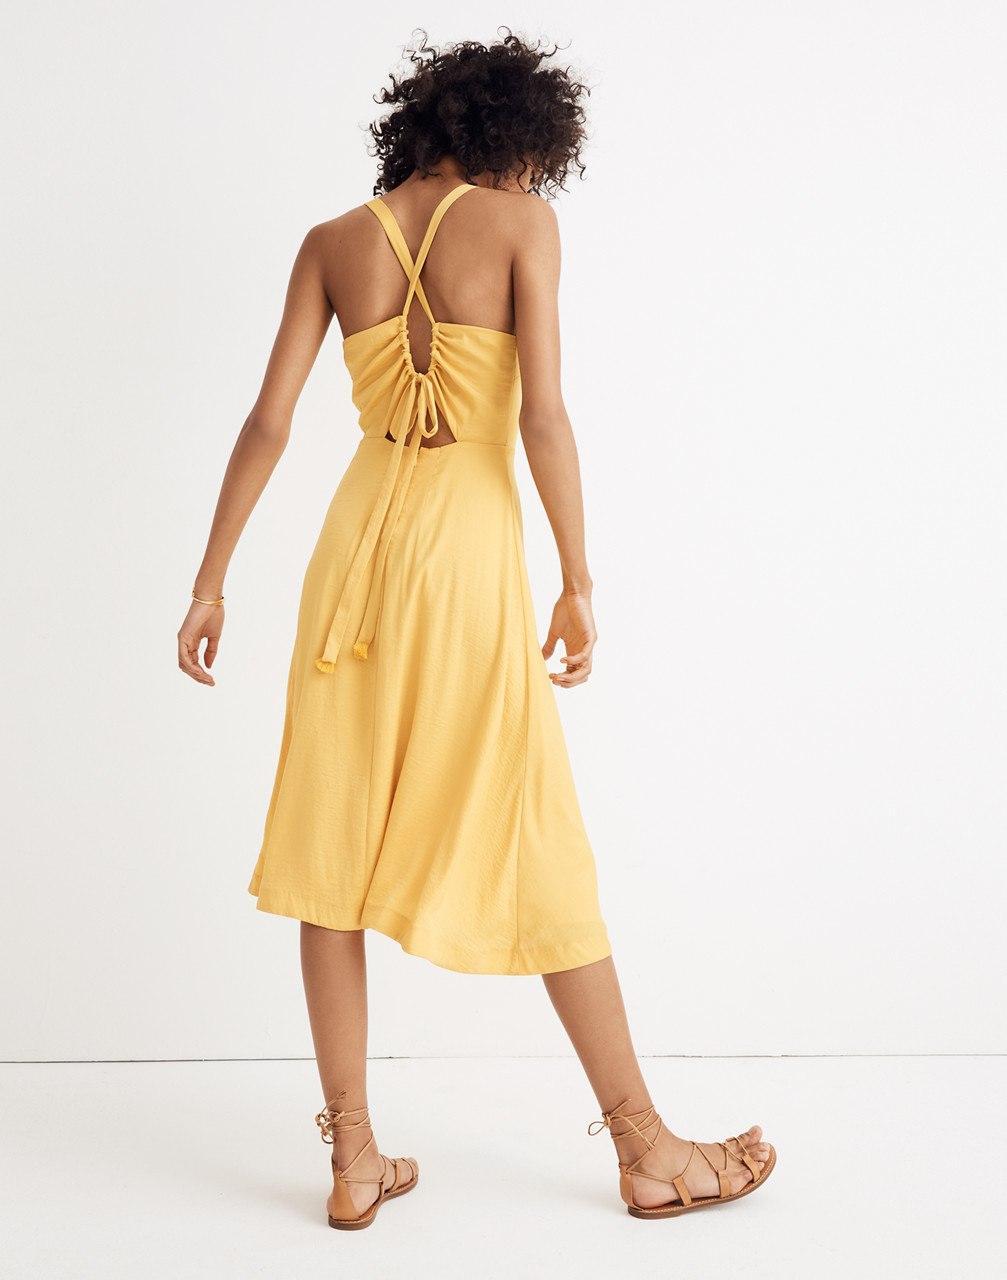 53587add47 Lyst - Madewell Cross-back Midi Dress in Yellow